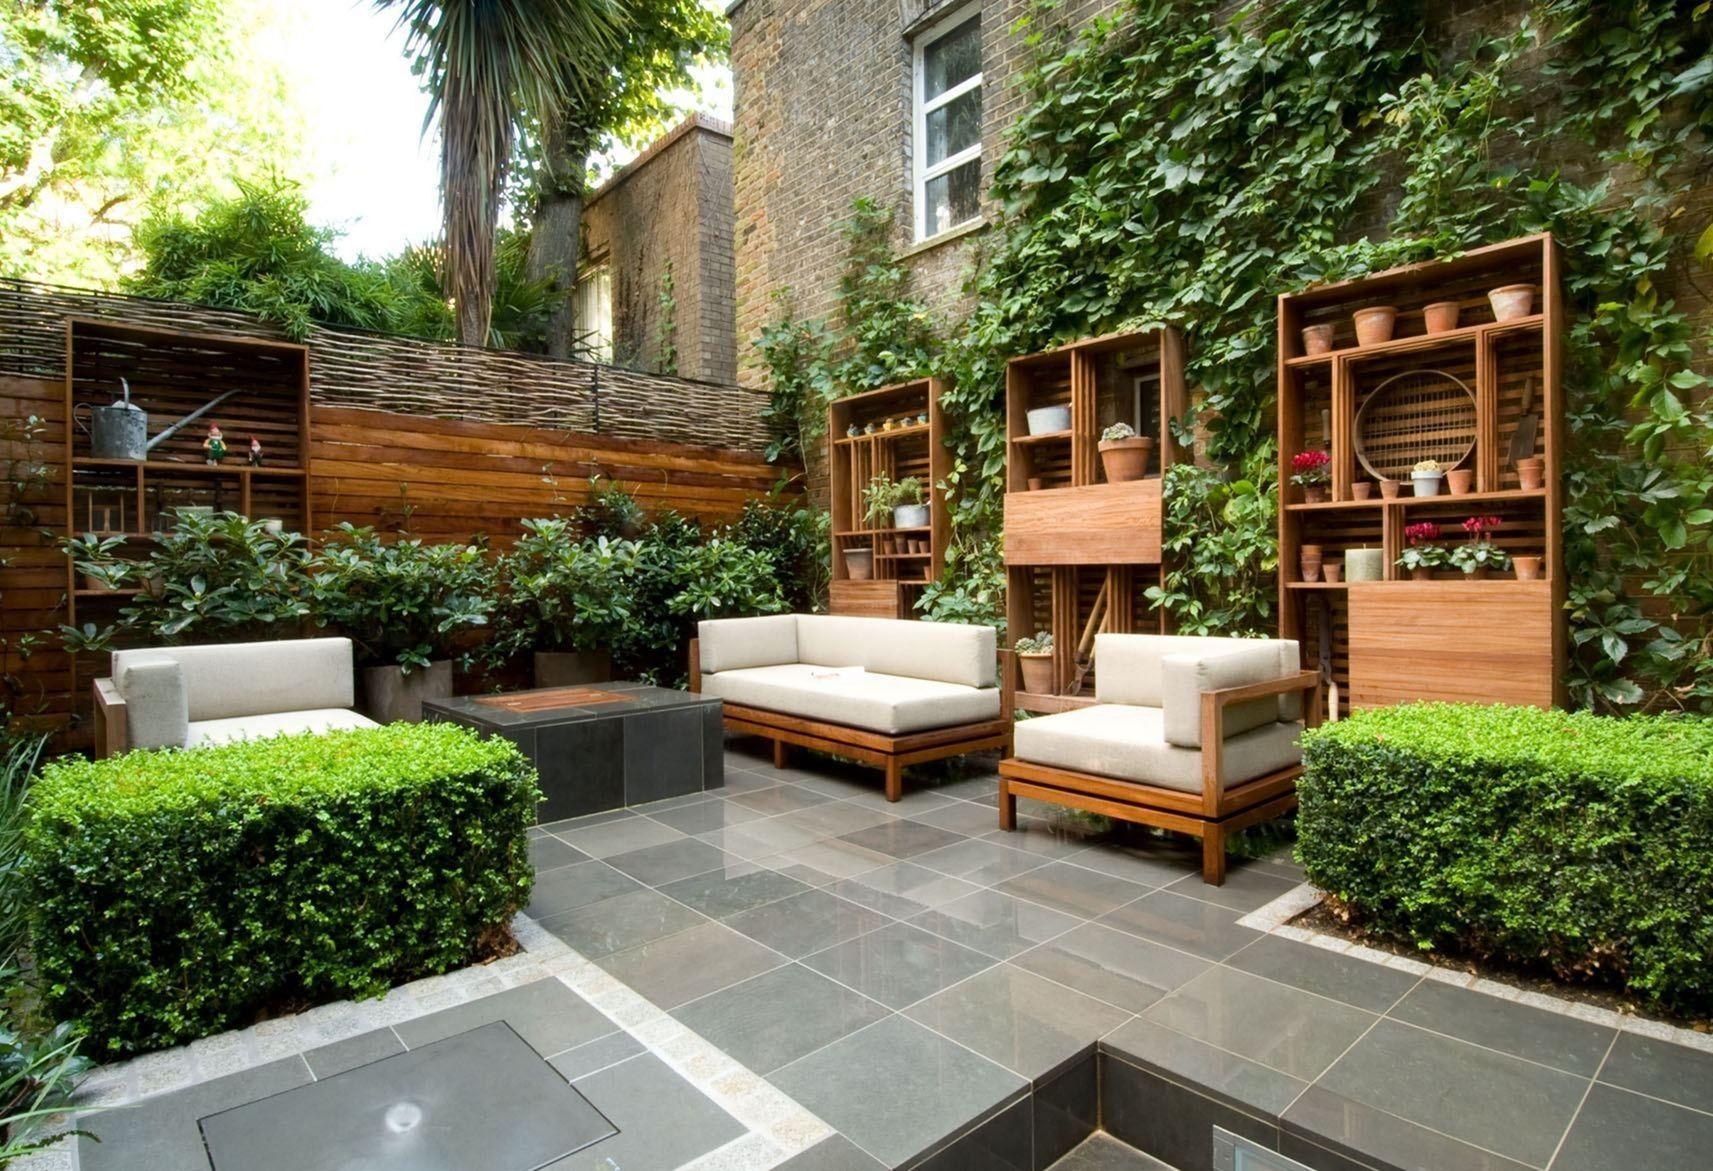 16 Extraordinary Backyard Garden Designs To Make The Home Yard